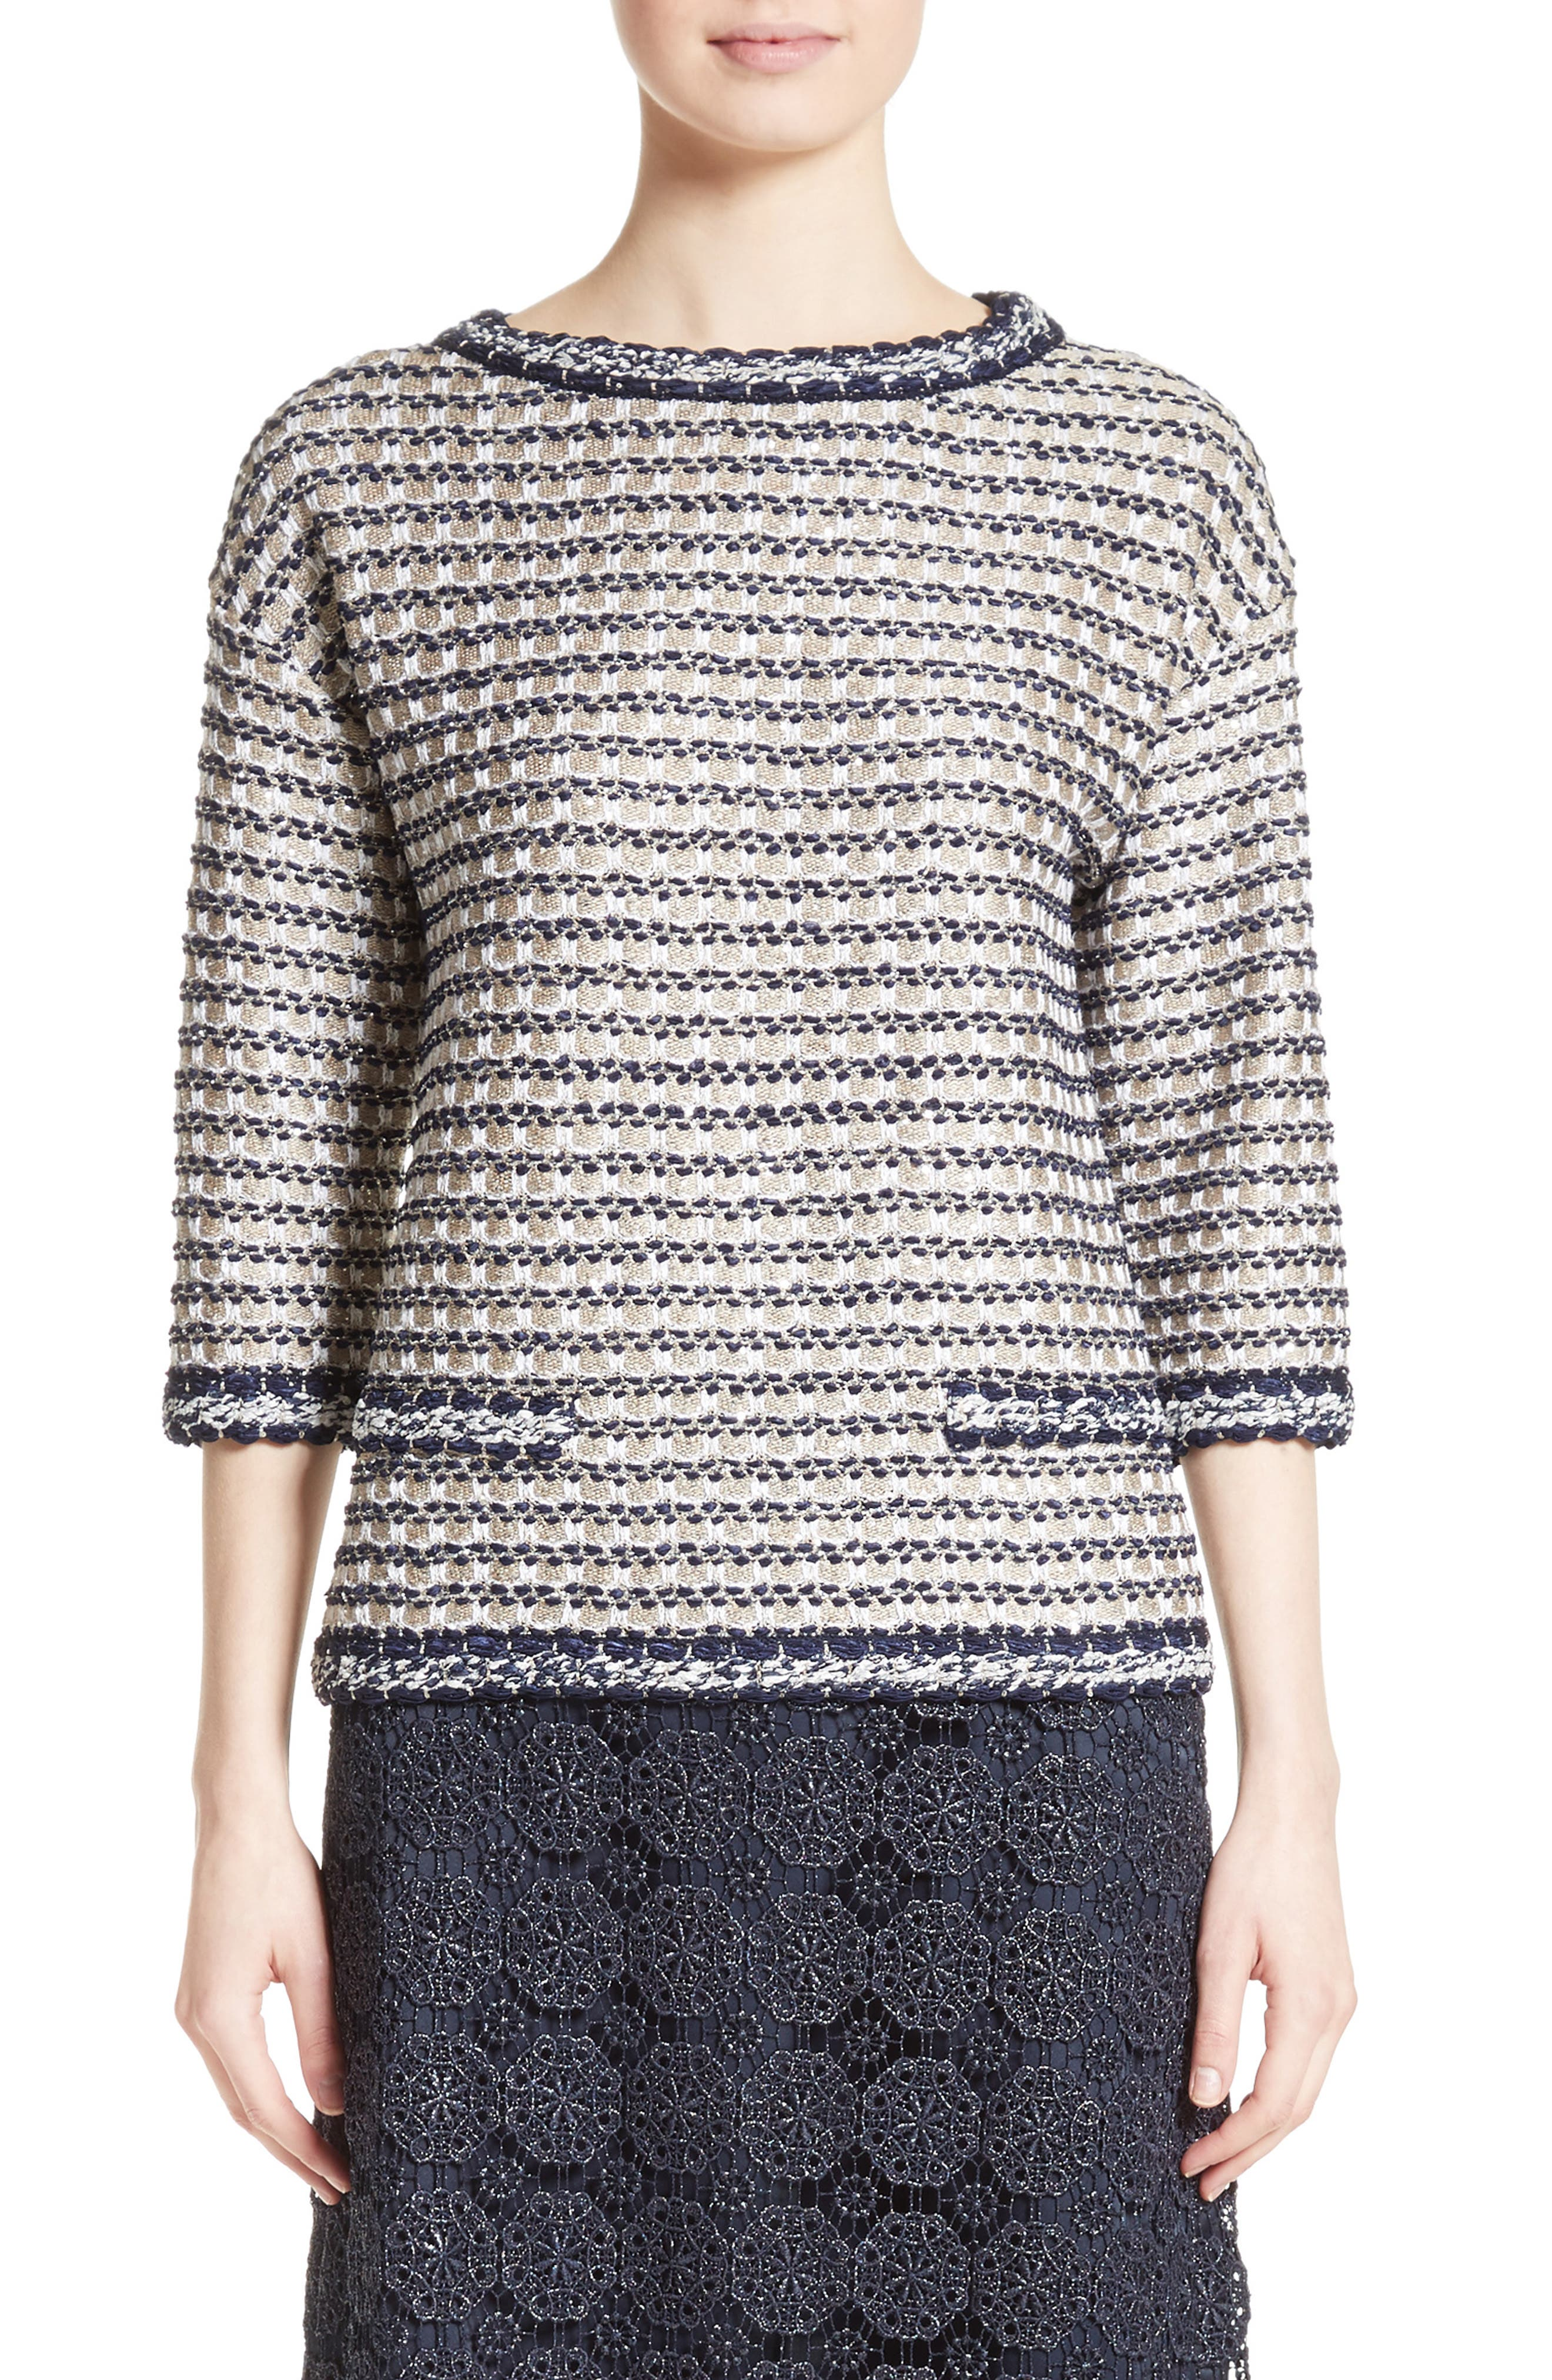 Vany Tweed Knit Top,                             Main thumbnail 1, color,                             Gold Multi